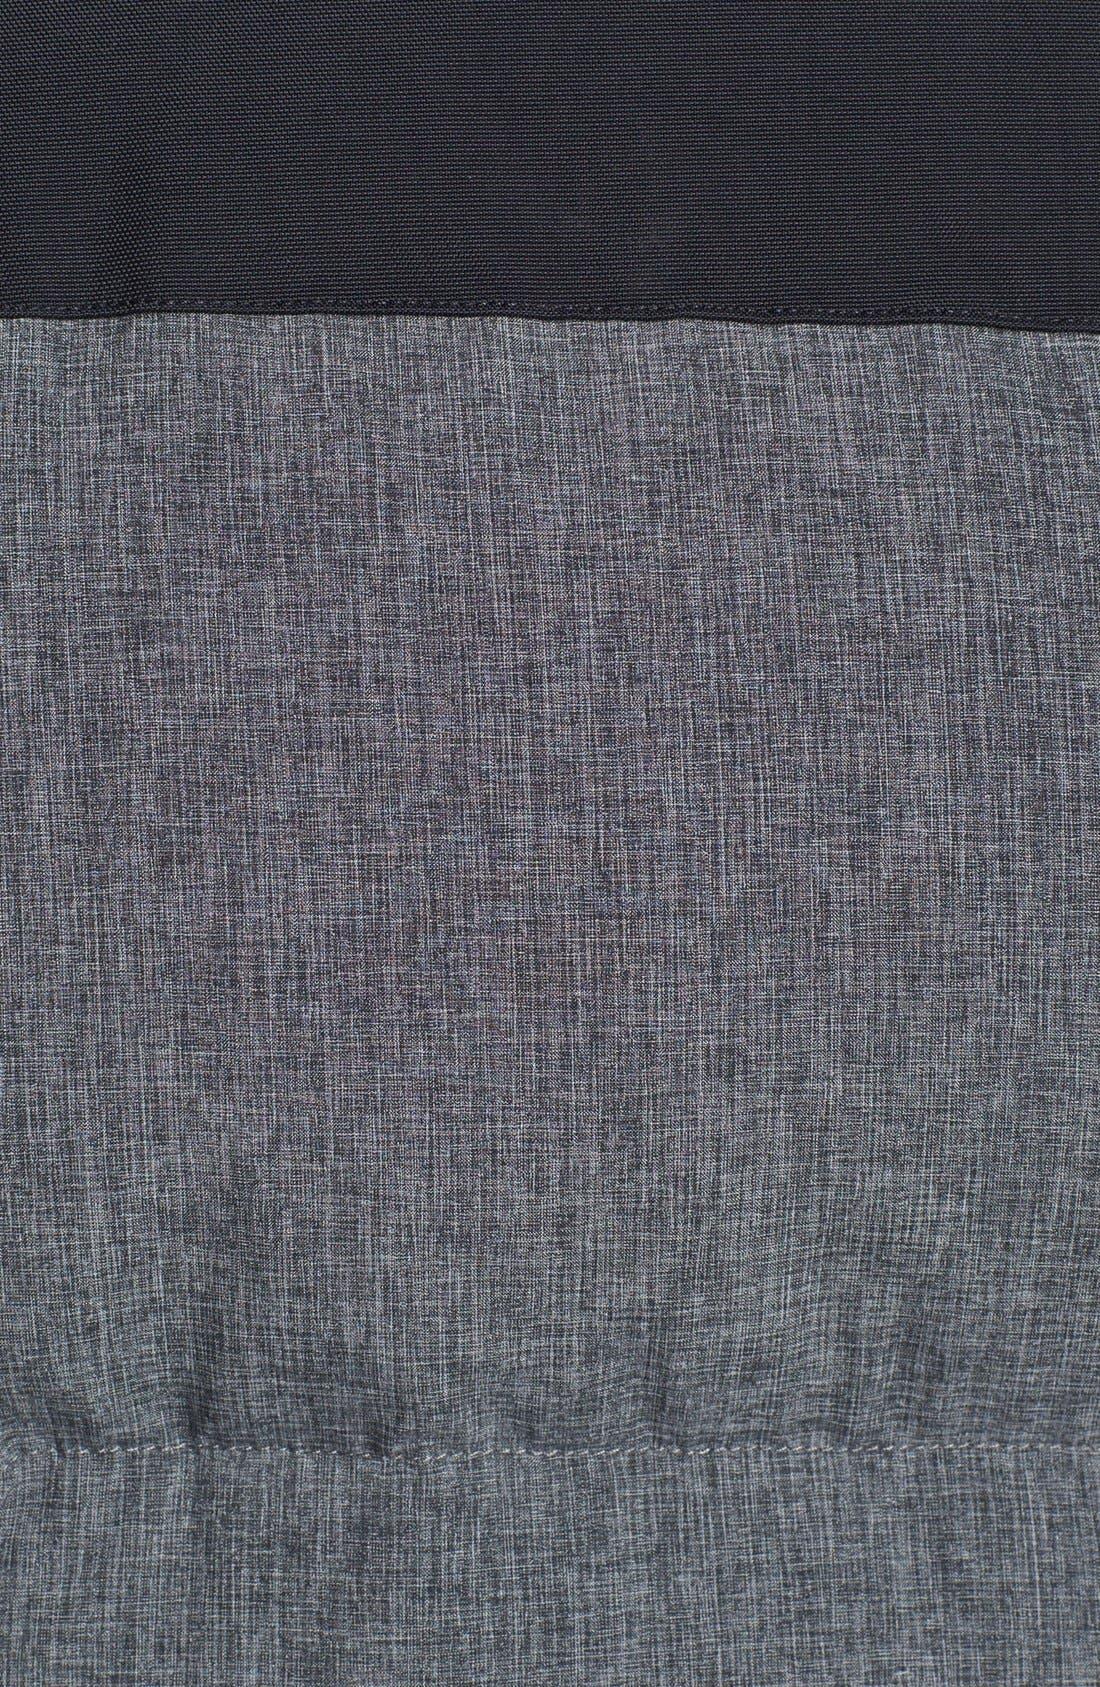 Alternate Image 3  - The North Face 'Nuptse - Uptown' Vest